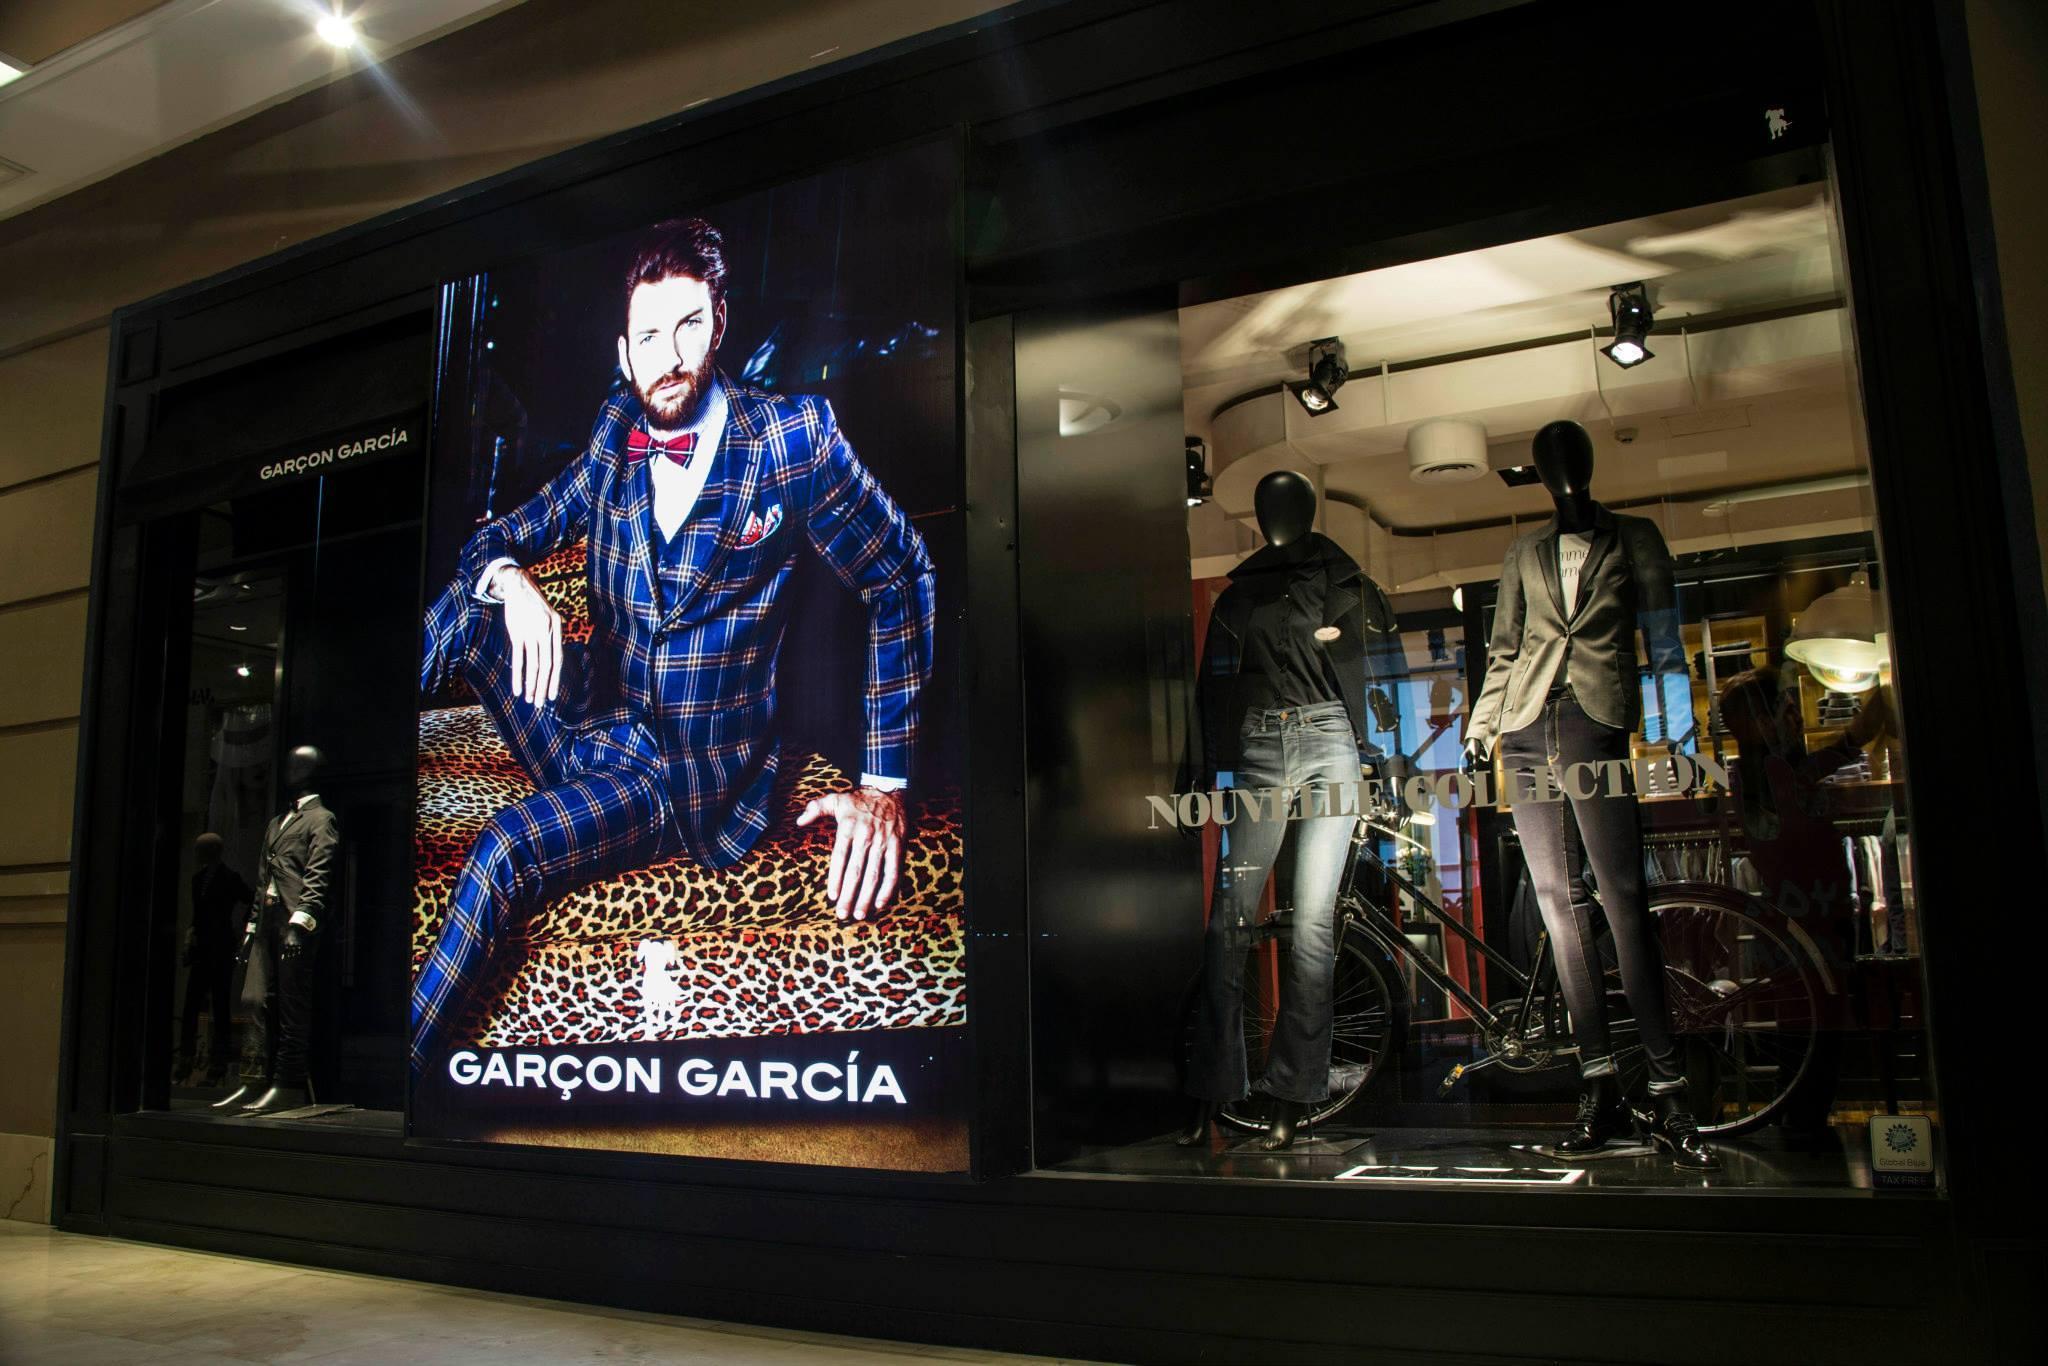 Garçon Garcia (Indumentaria):